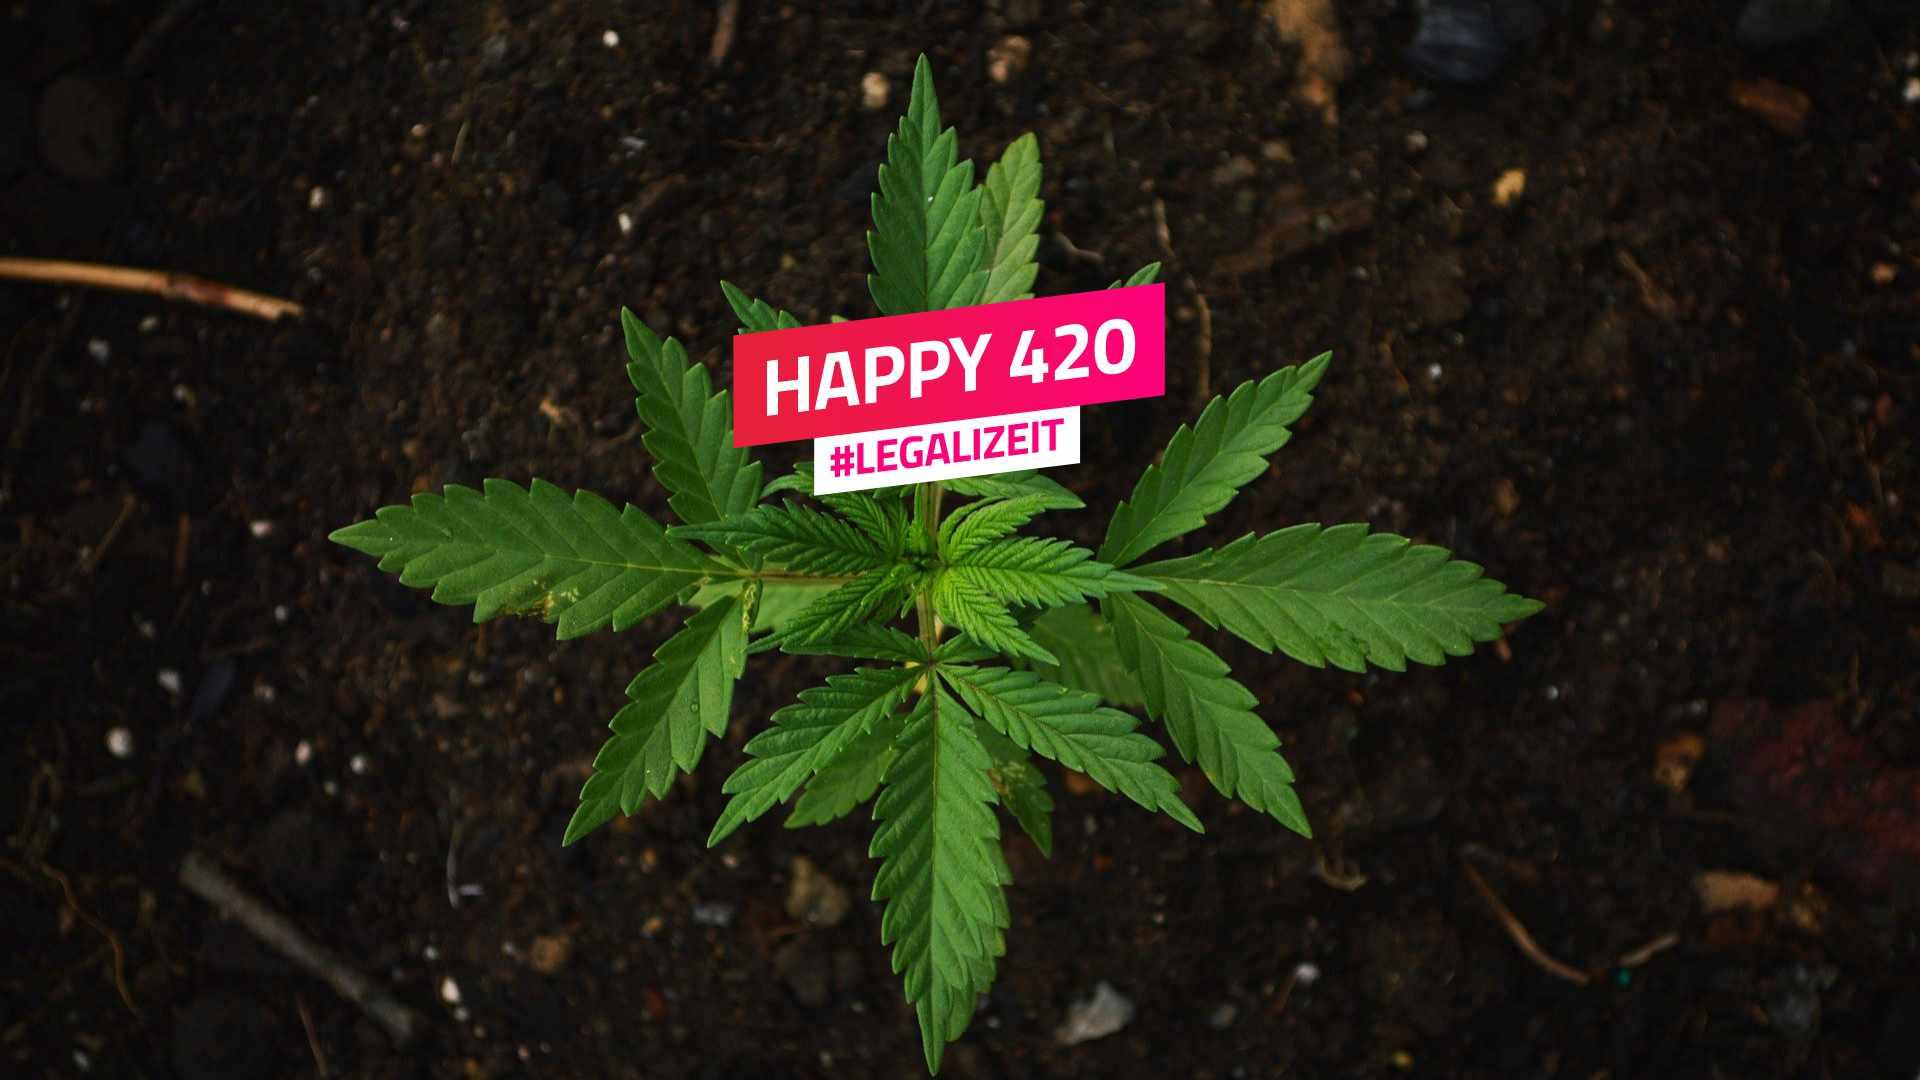 Happy 420 – Drogenpolitik neu denken!